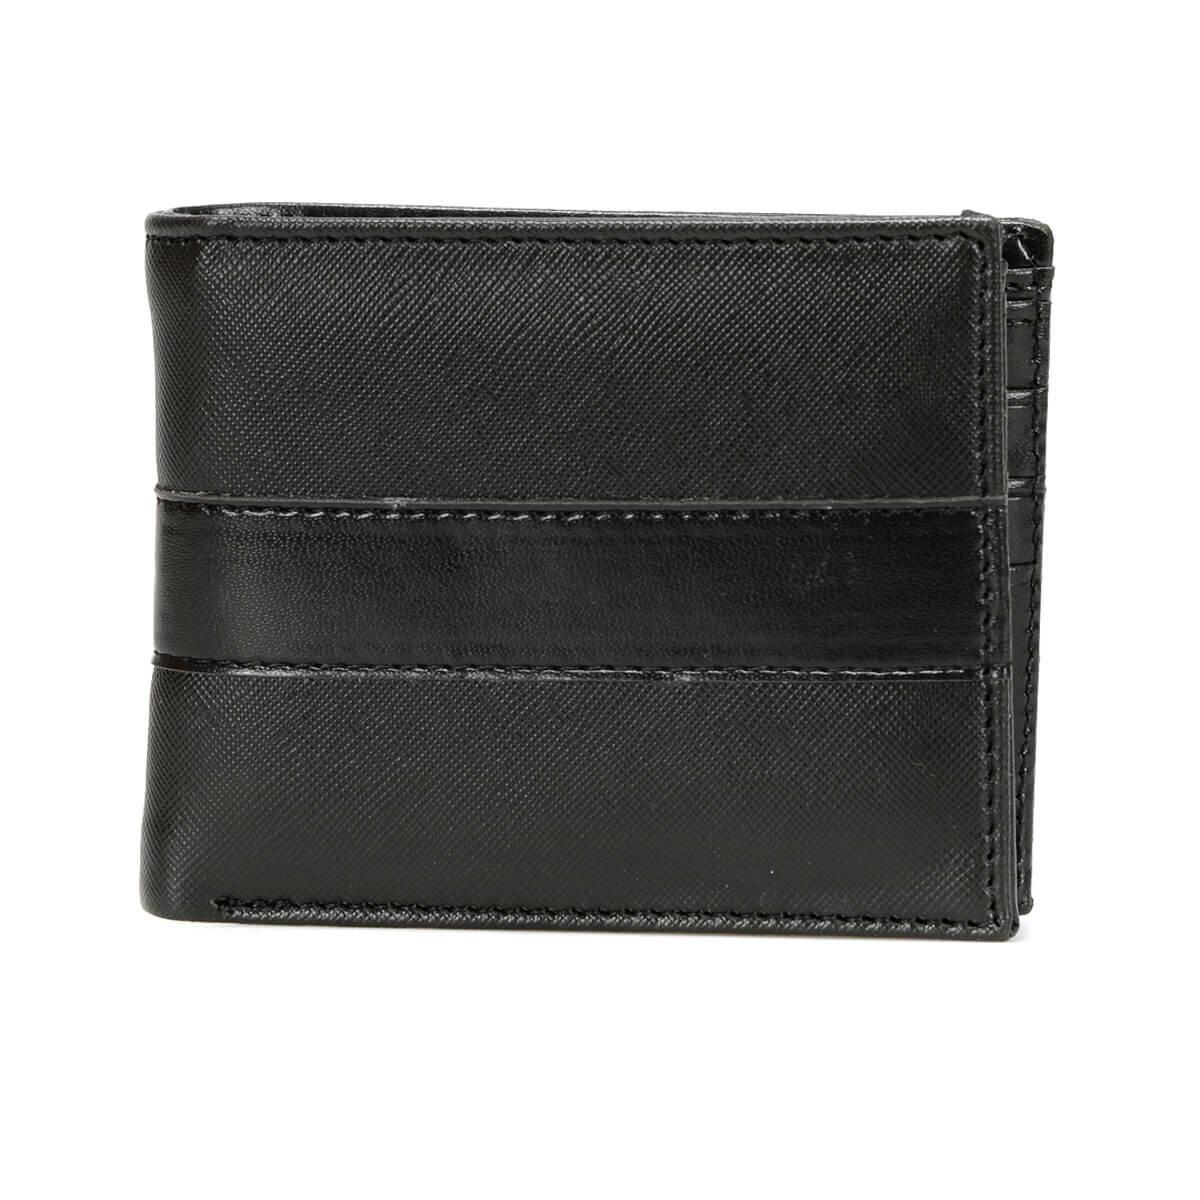 FLO MKNY2206 Black Male Wallet Garamond